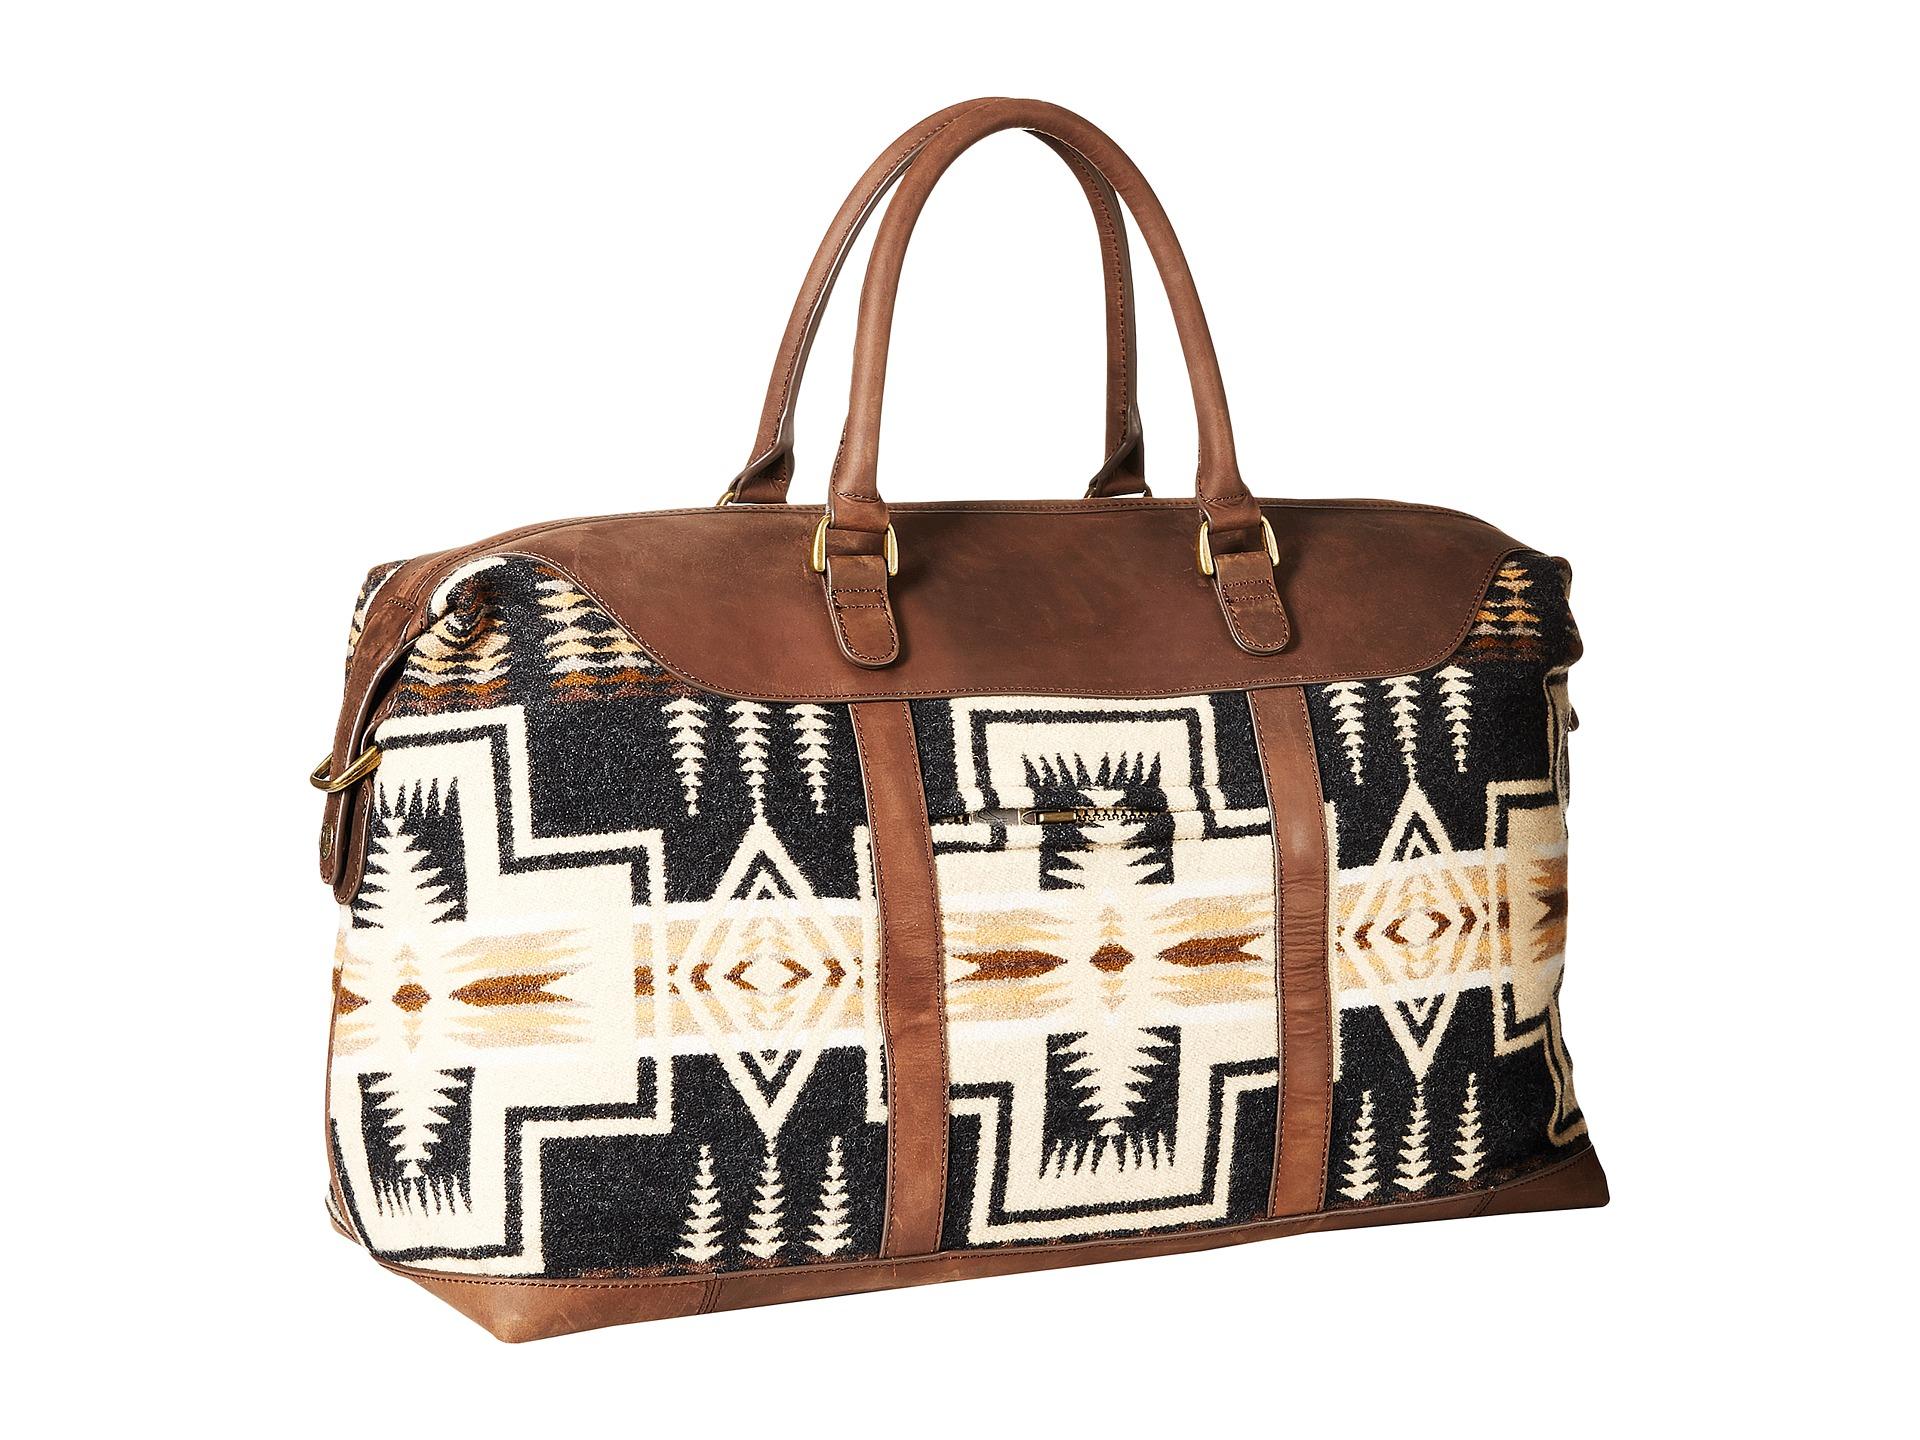 Find great deals on eBay for pendleton bag. Shop with confidence.